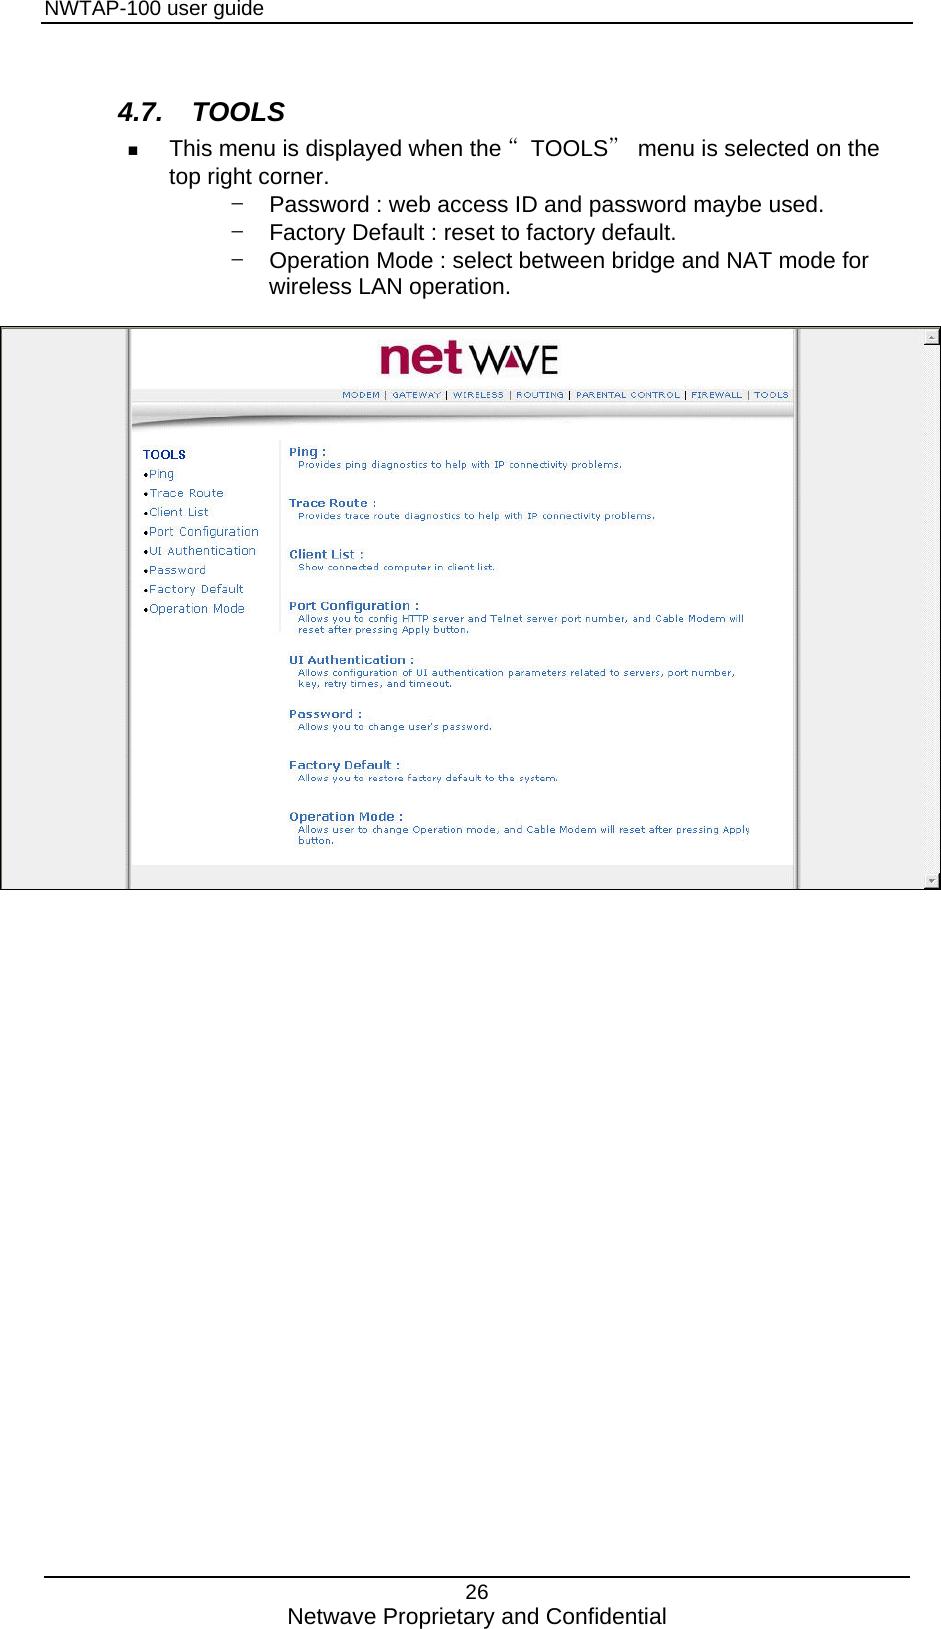 NETWAVE NWTAP-100 Wireless TAP User Manual